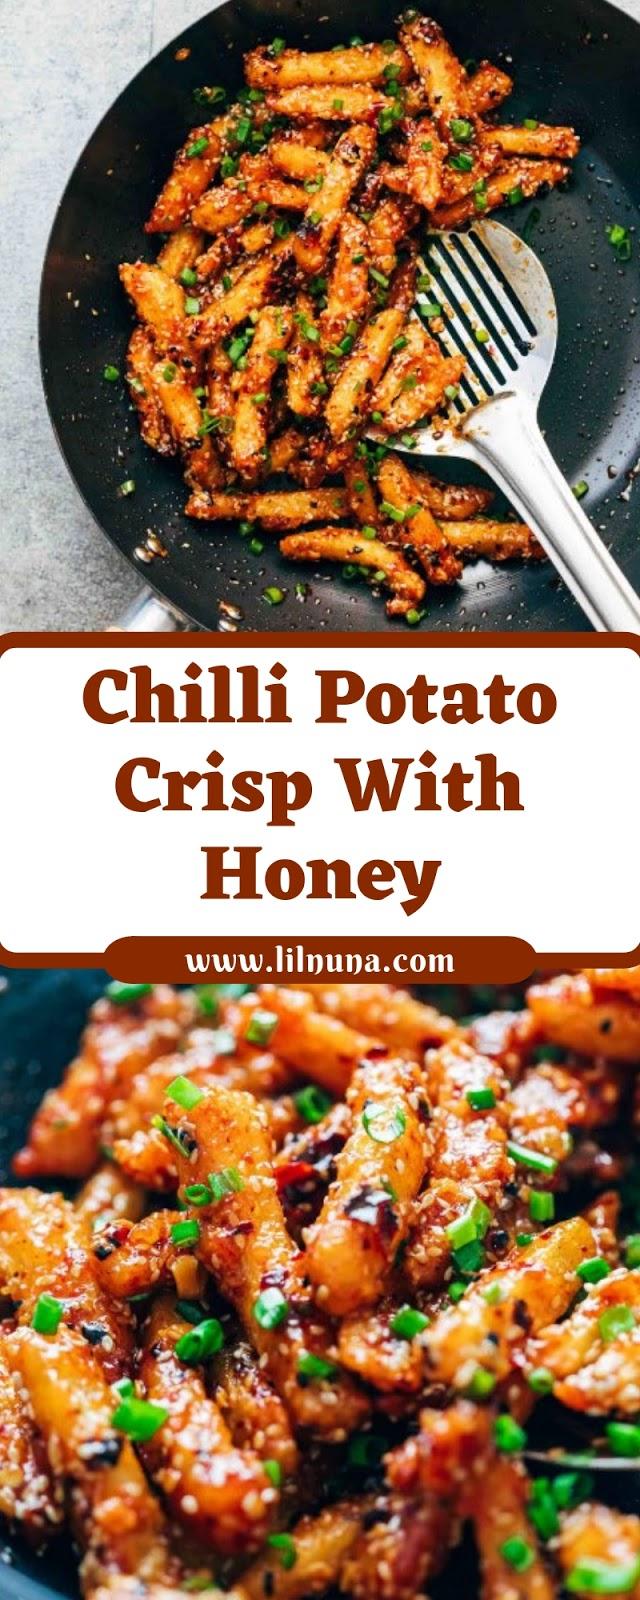 Chilli Potato Crisp With Honey